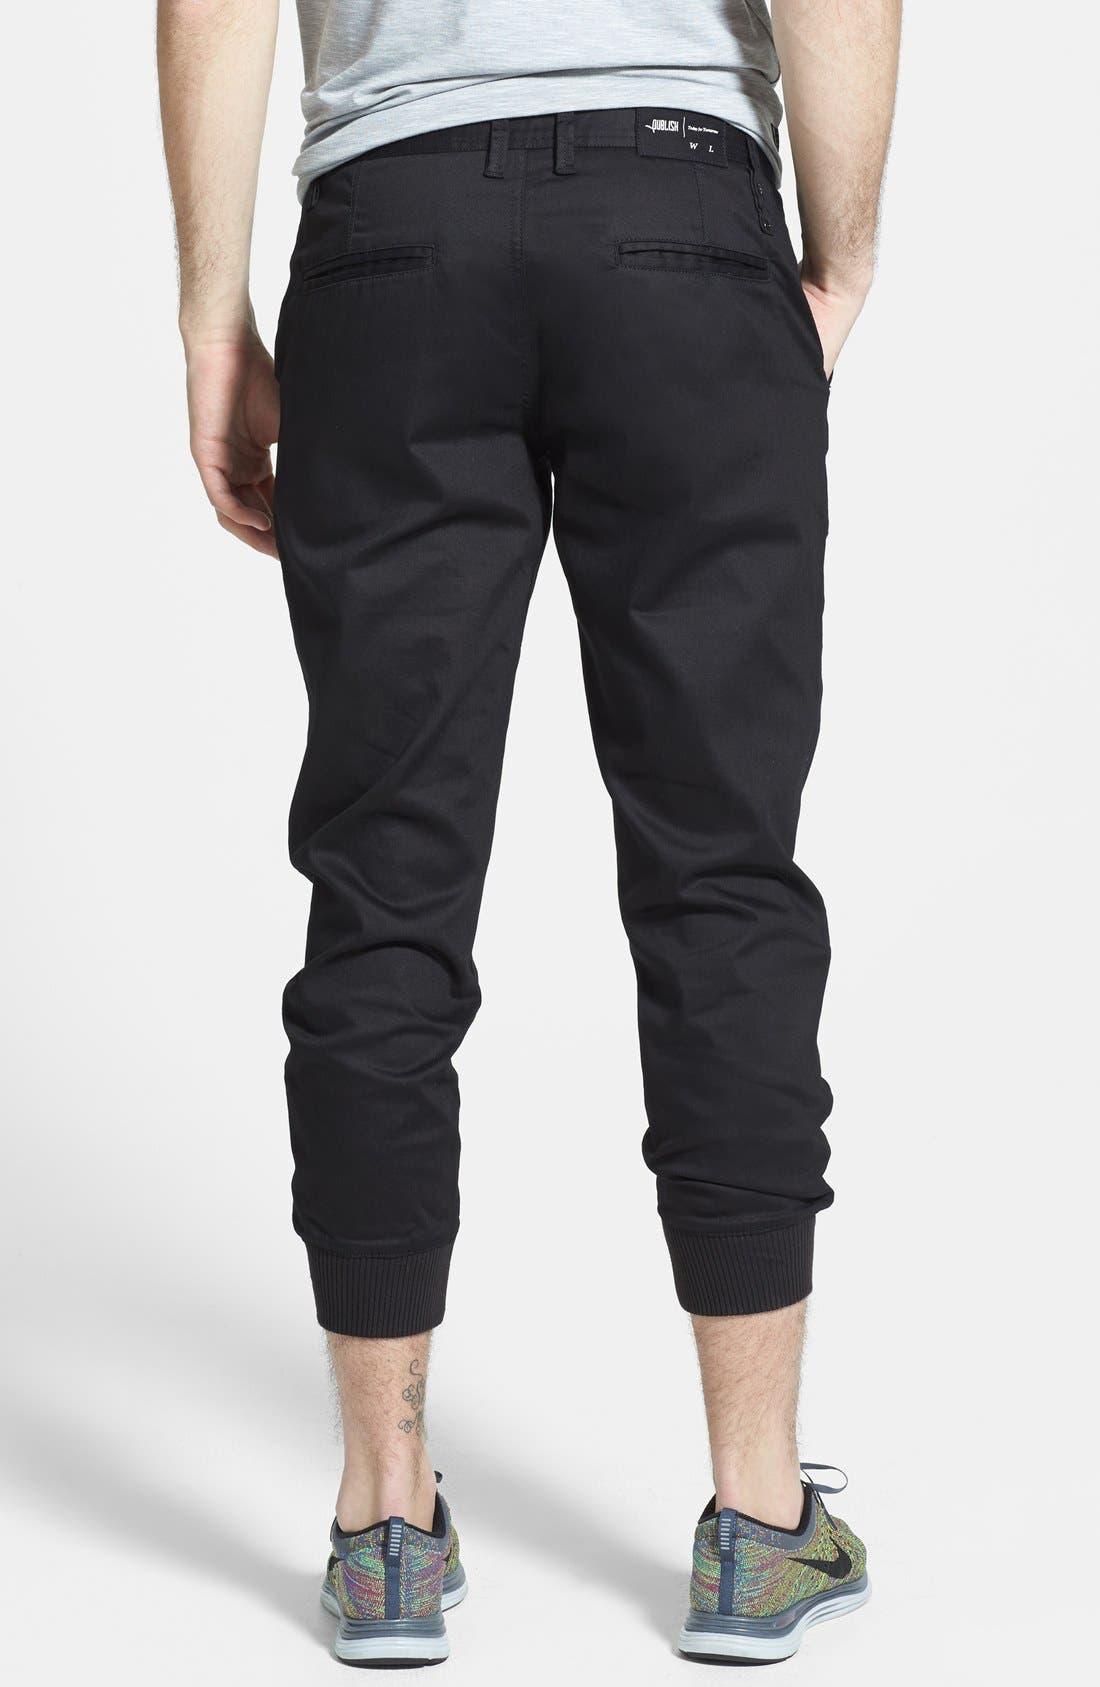 PUBLISH BRAND, 'Legacy' Tailored Fit Jogger Pants, Alternate thumbnail 2, color, 001